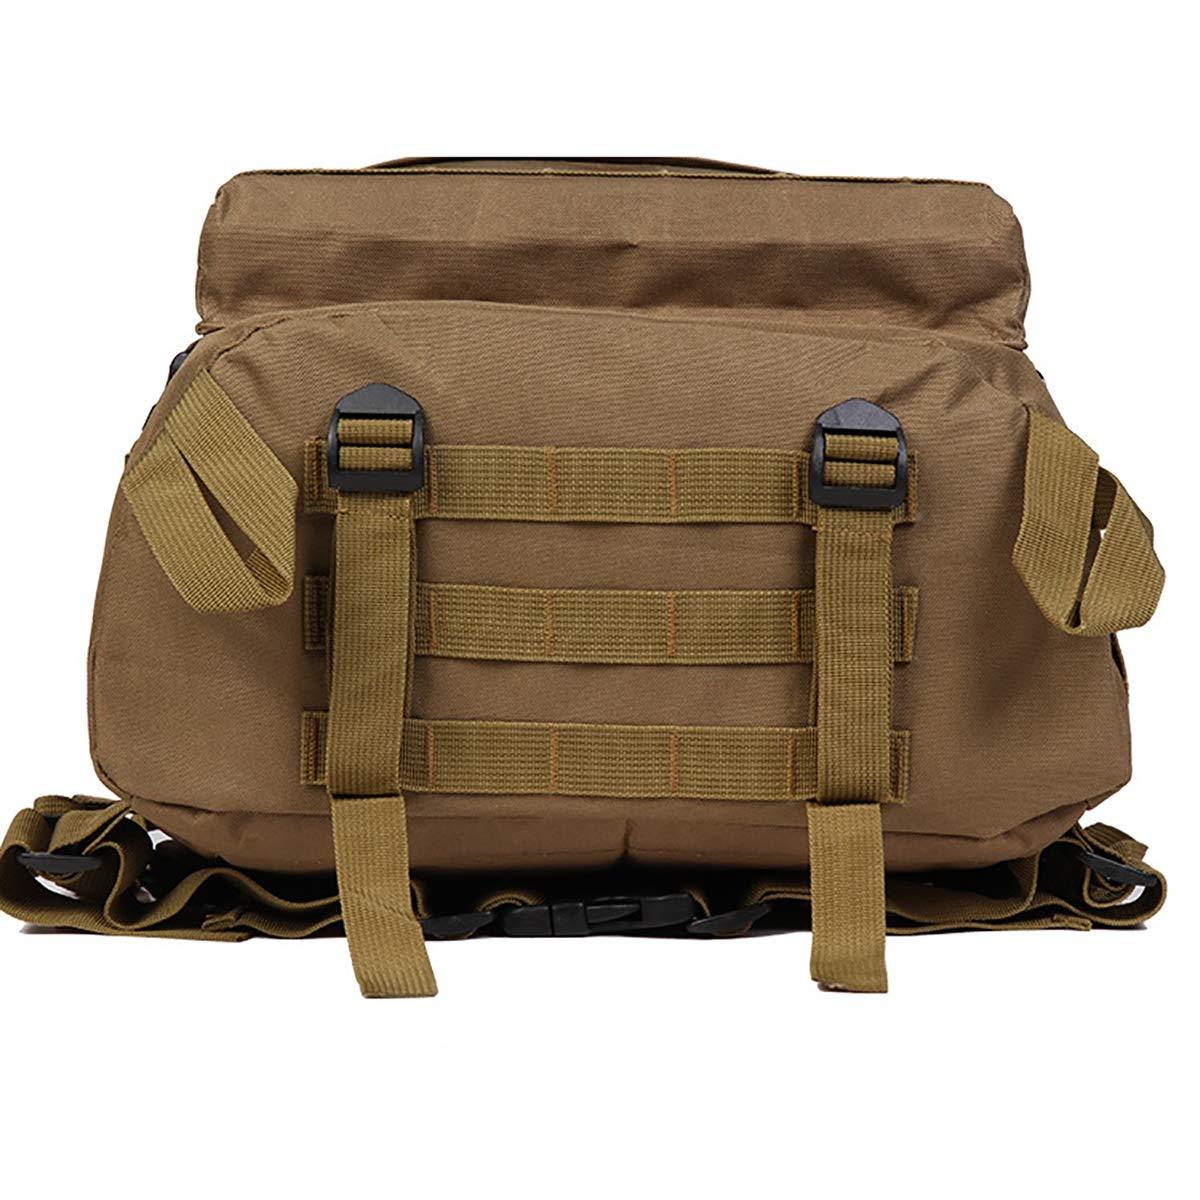 Amazon.com : ZUZEN Outdoor Sport Military Tactical Climbing Mountaineering Backpack Camping Hiking Backpack Travel Outdoor Bag, A : Sports & Outdoors